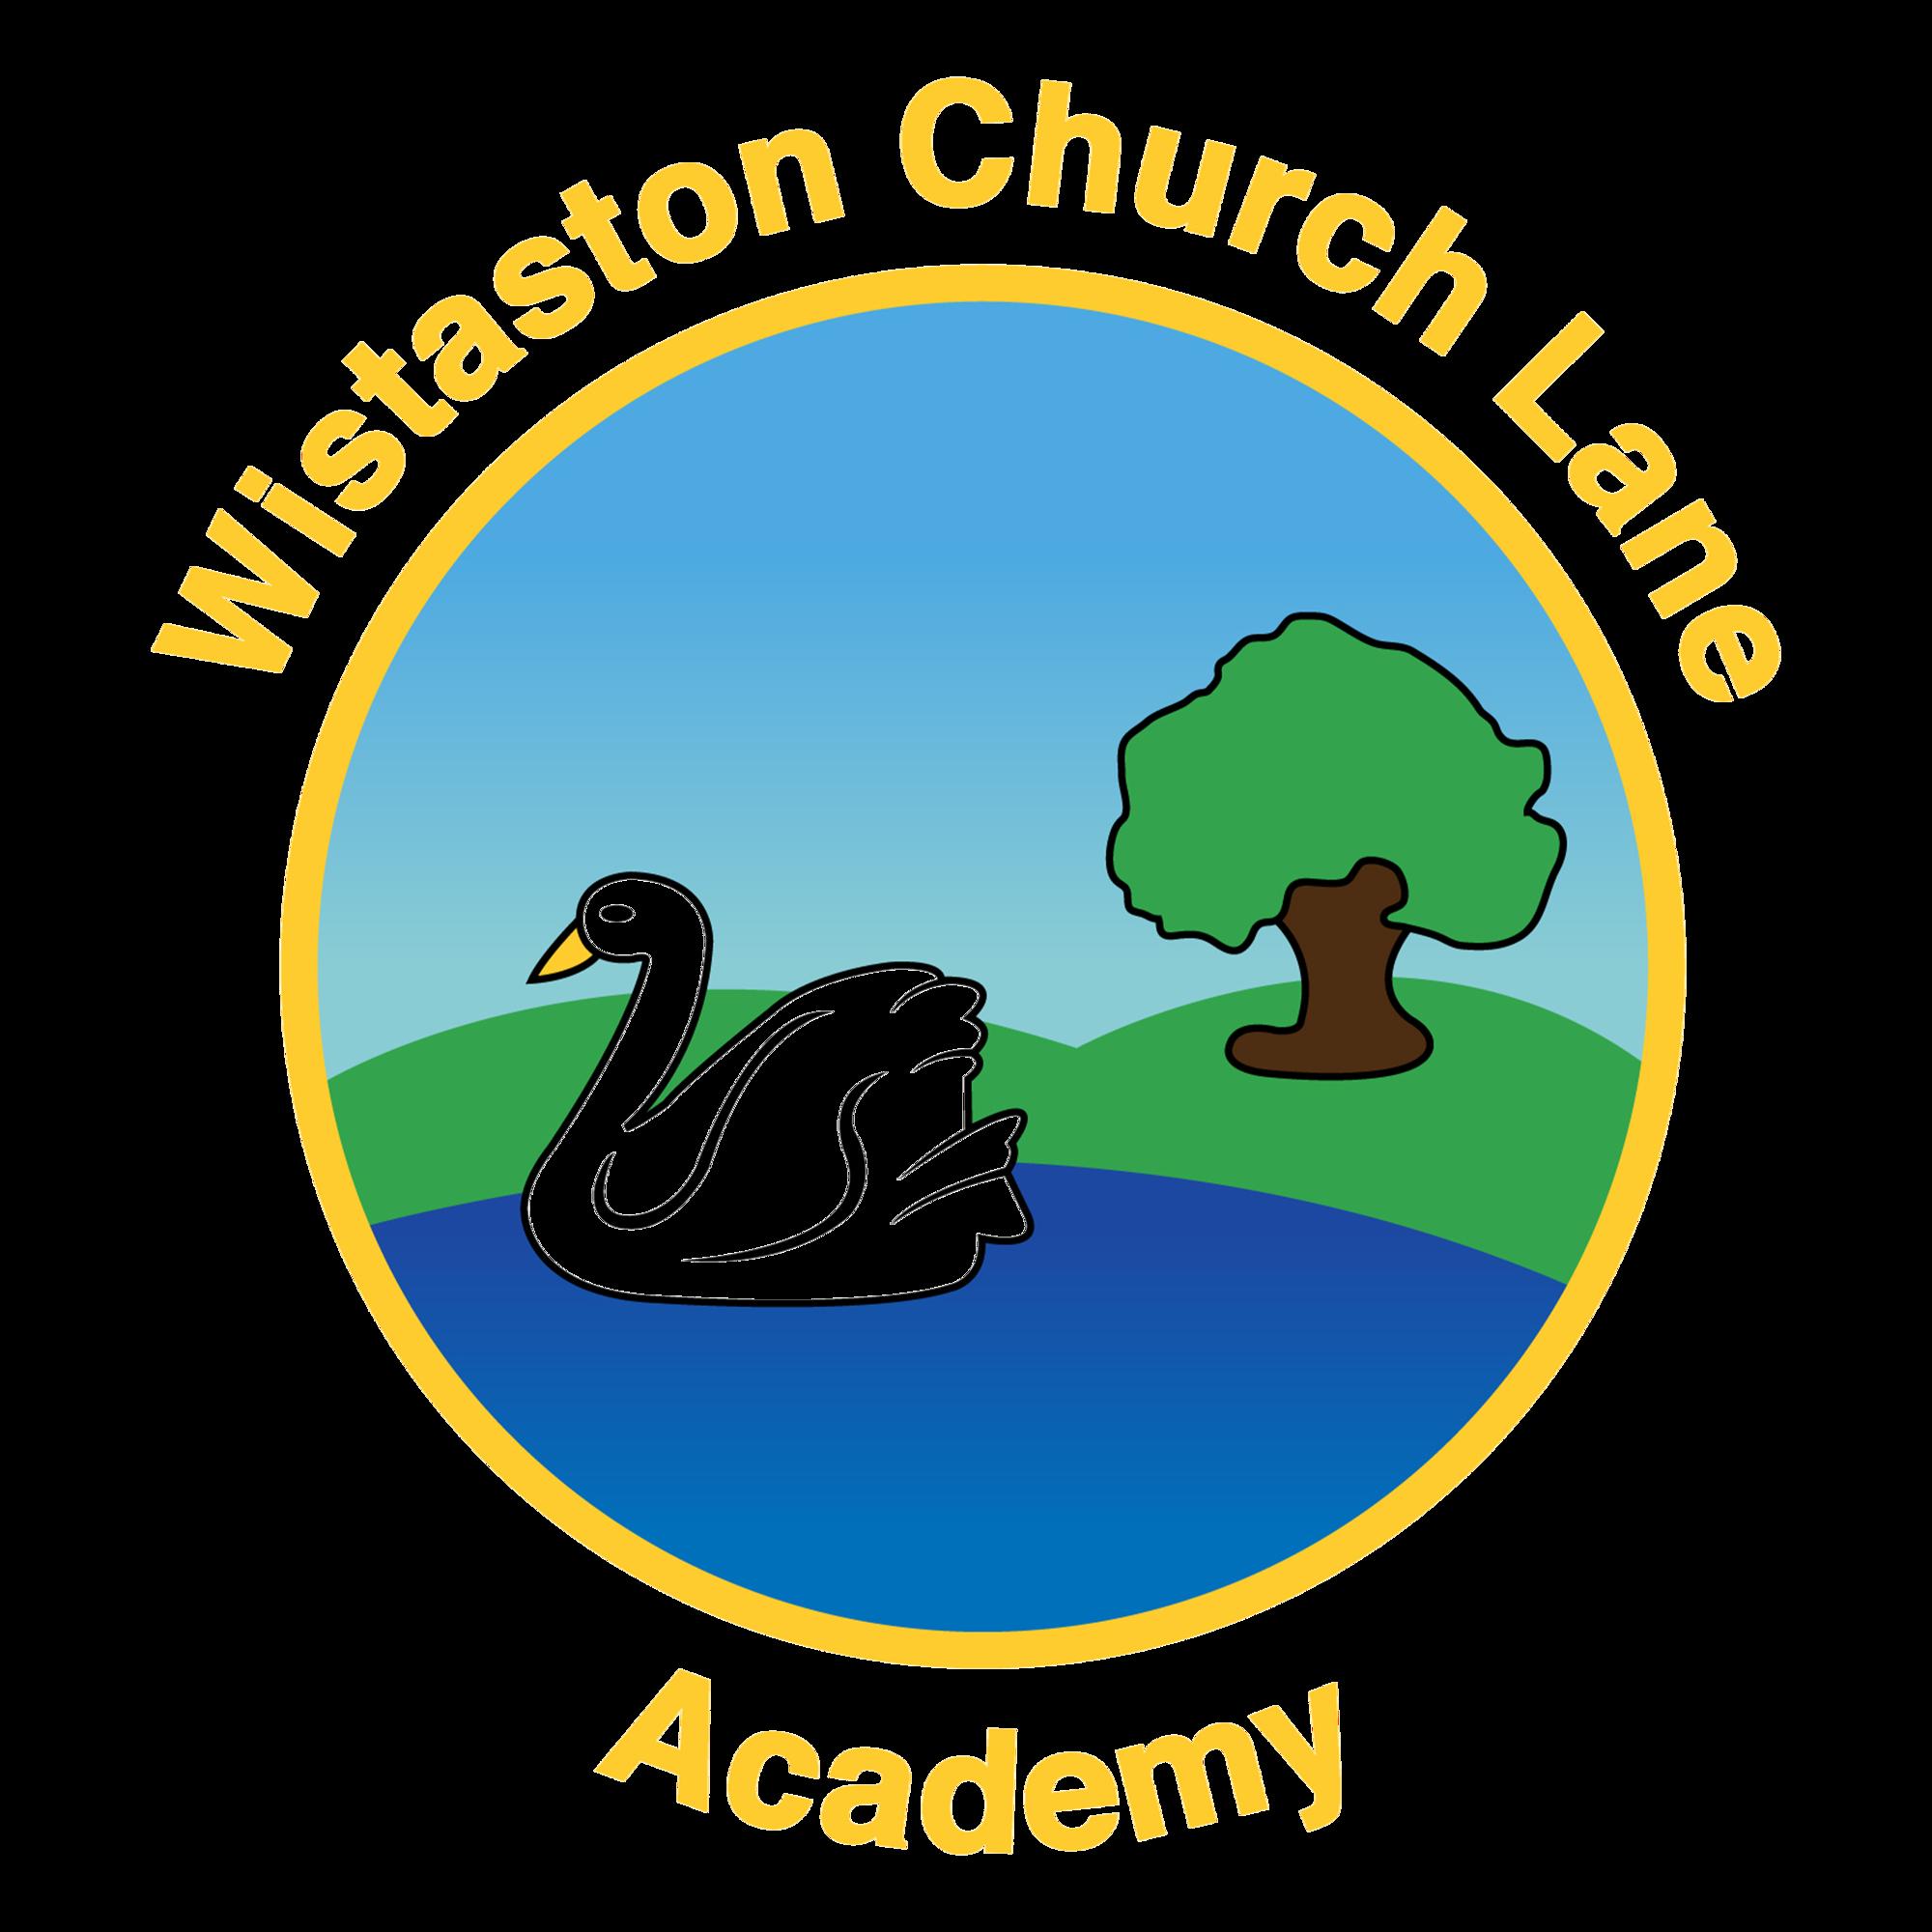 Wistaston Church Lane Academy School